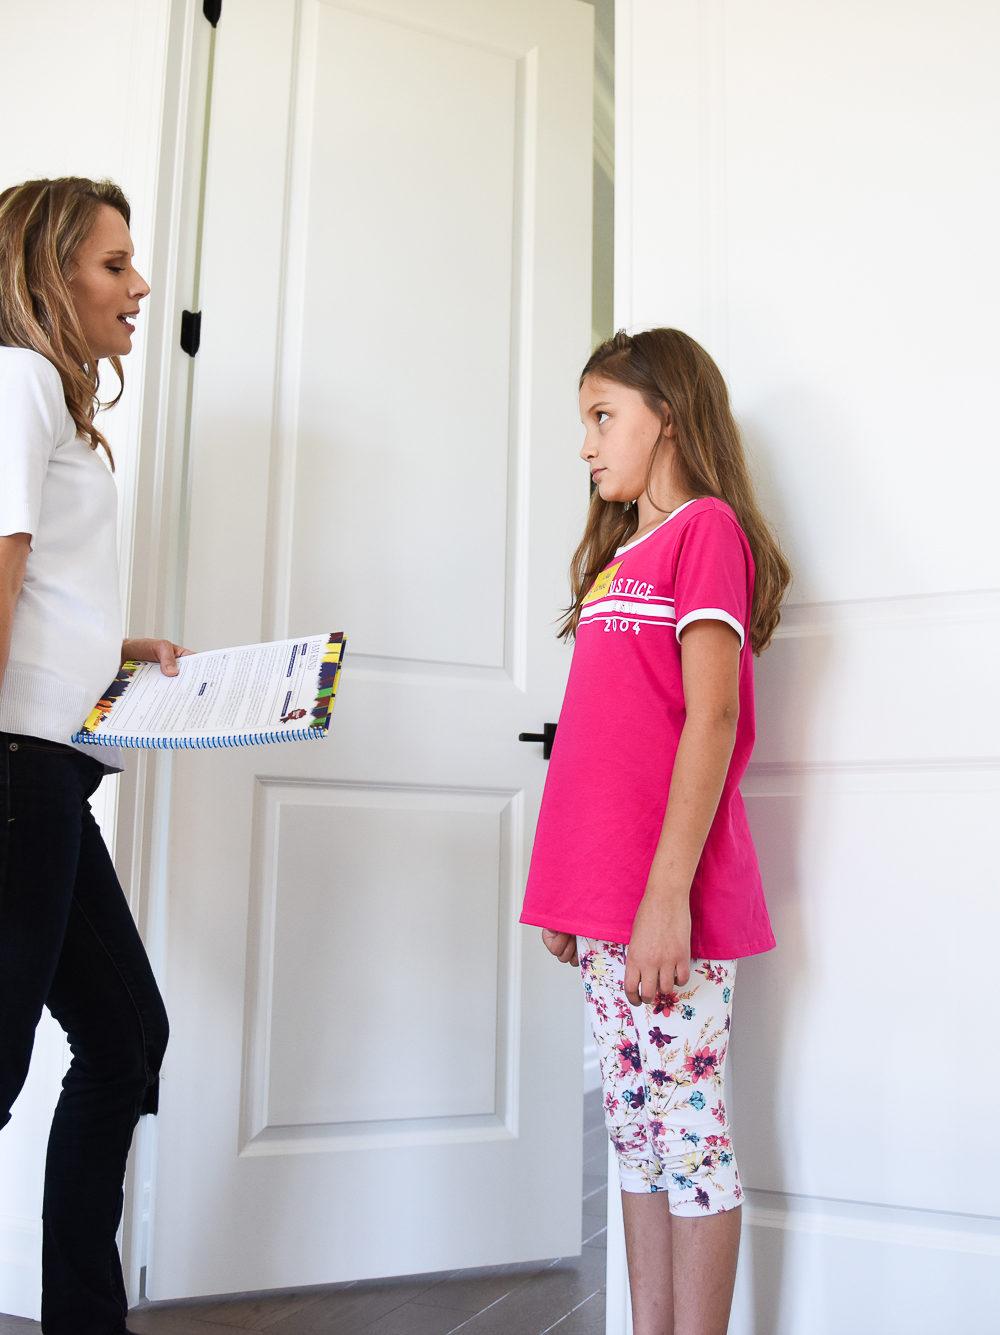 Kimberly talking to daughter